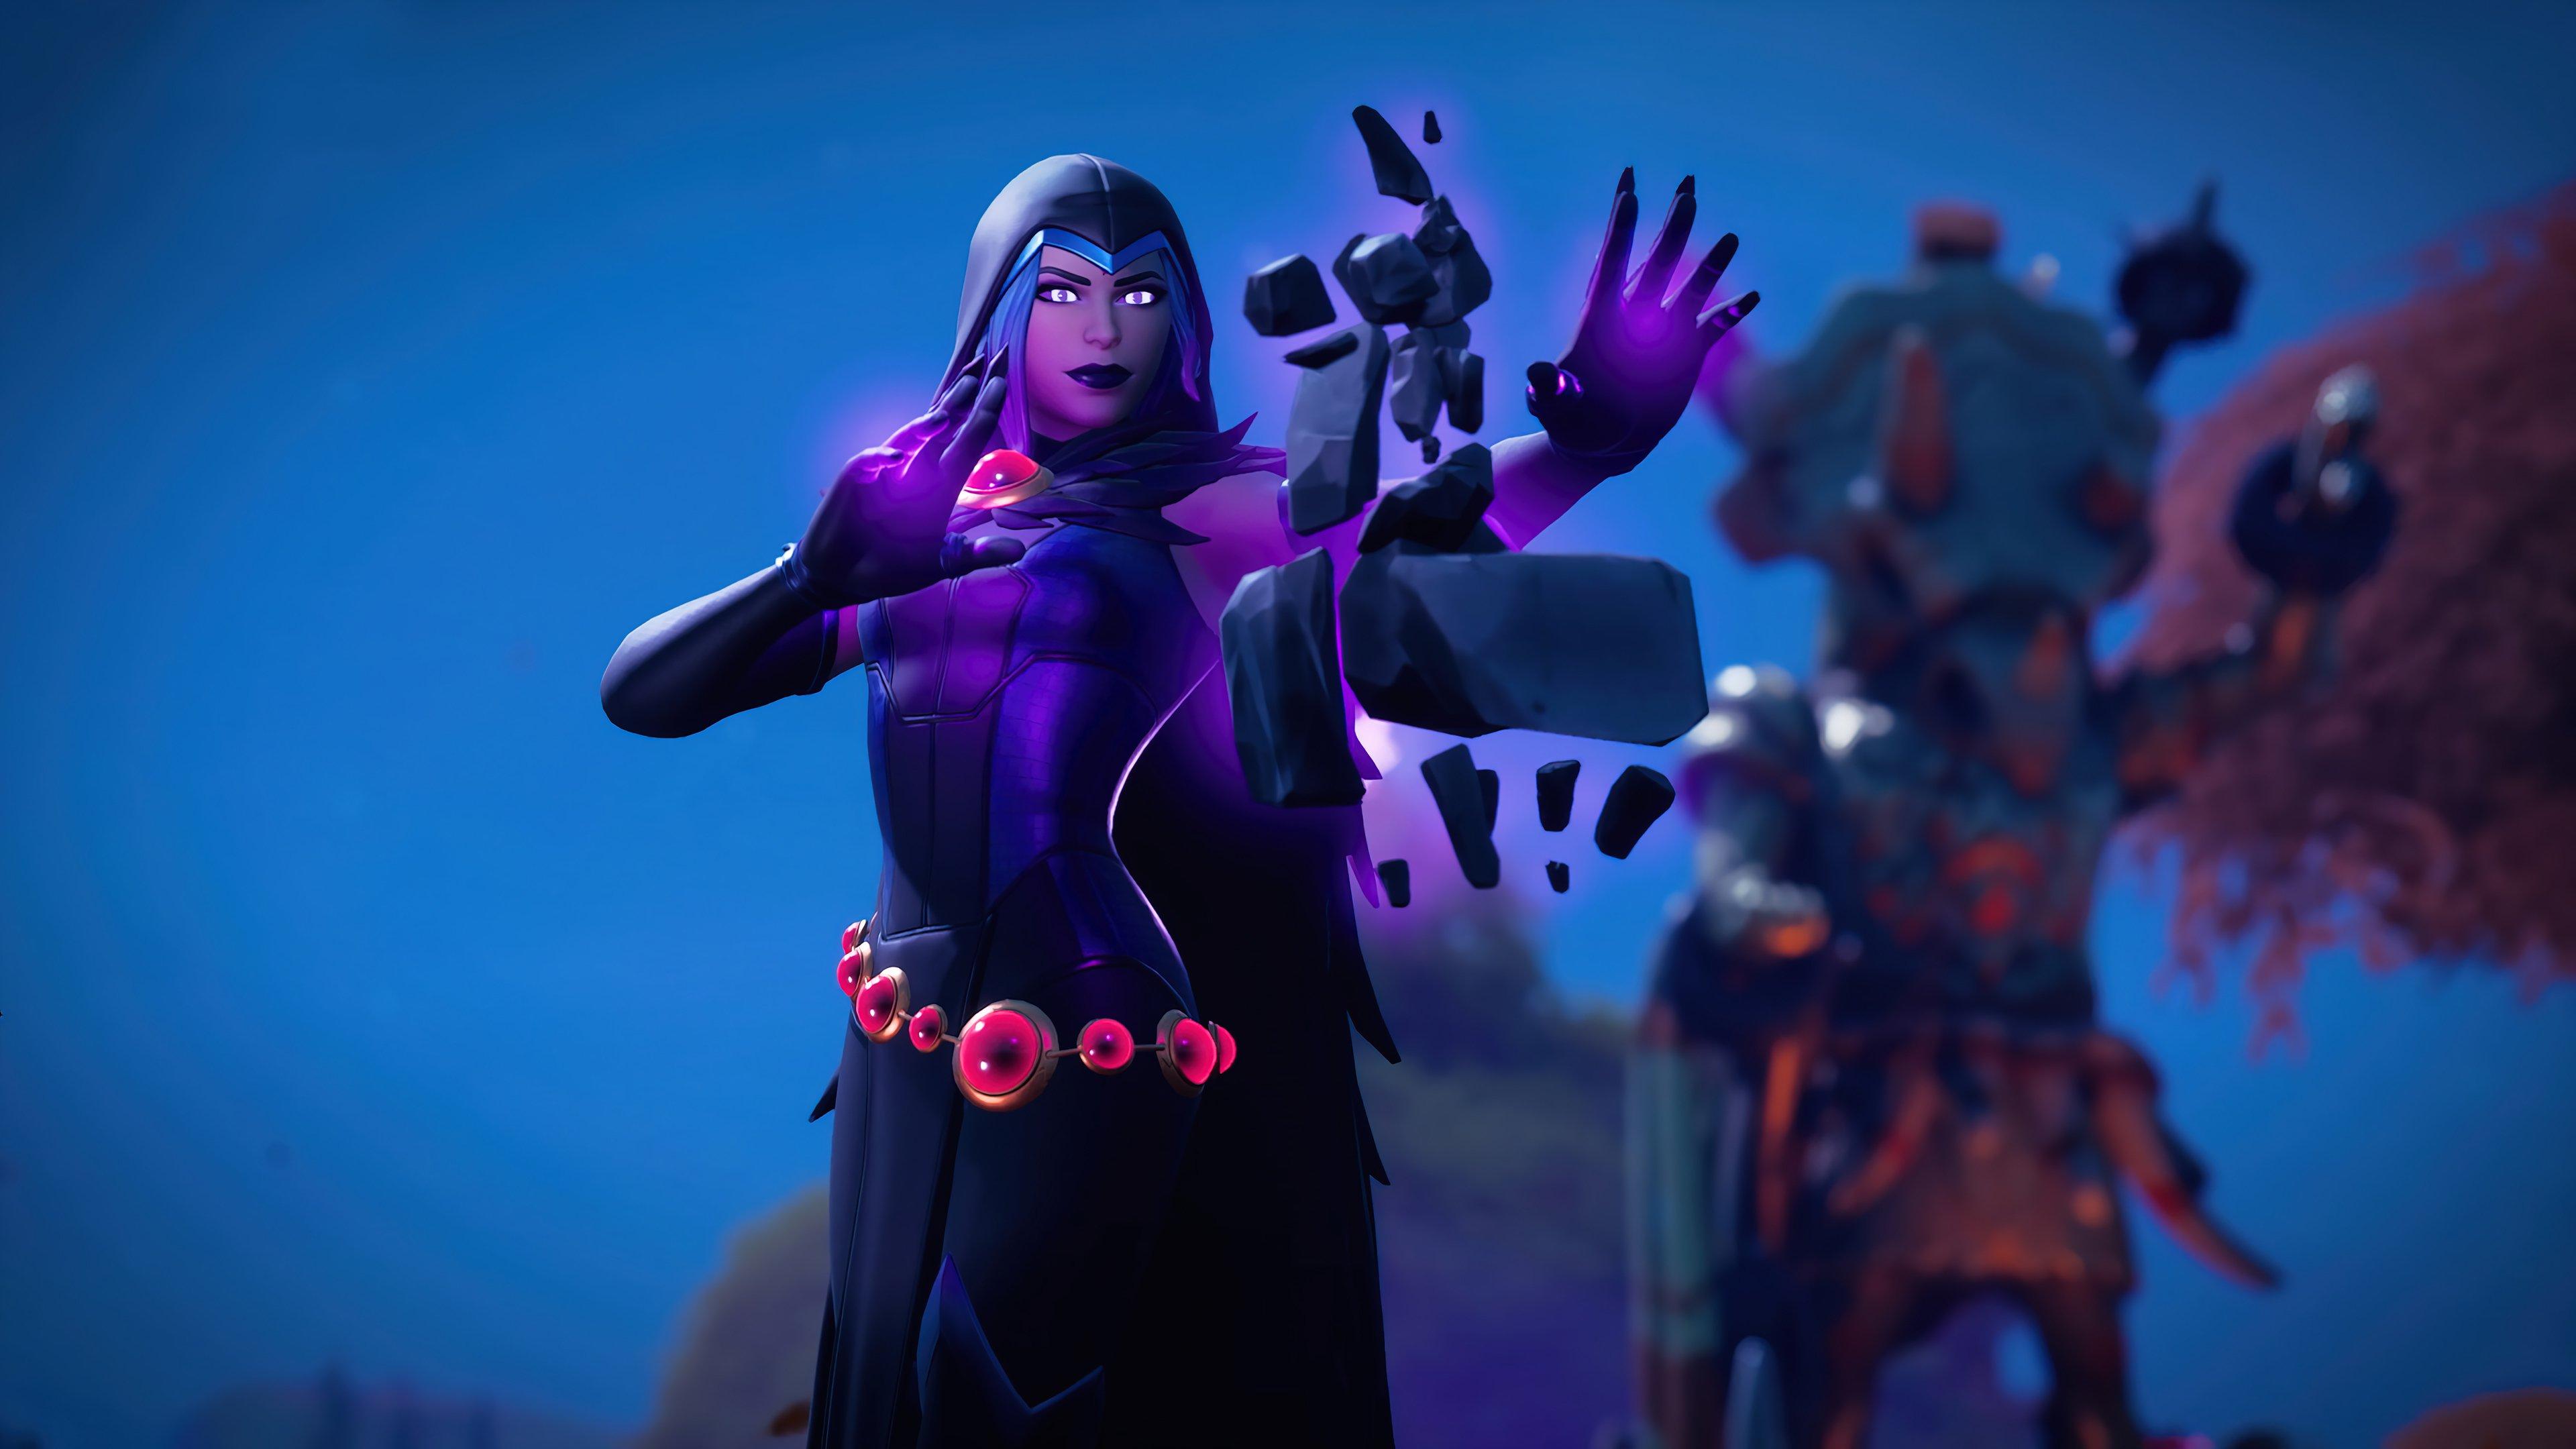 Fondos de pantalla Fortnite Rebirth Raven Capitulo 2 Temporada 6